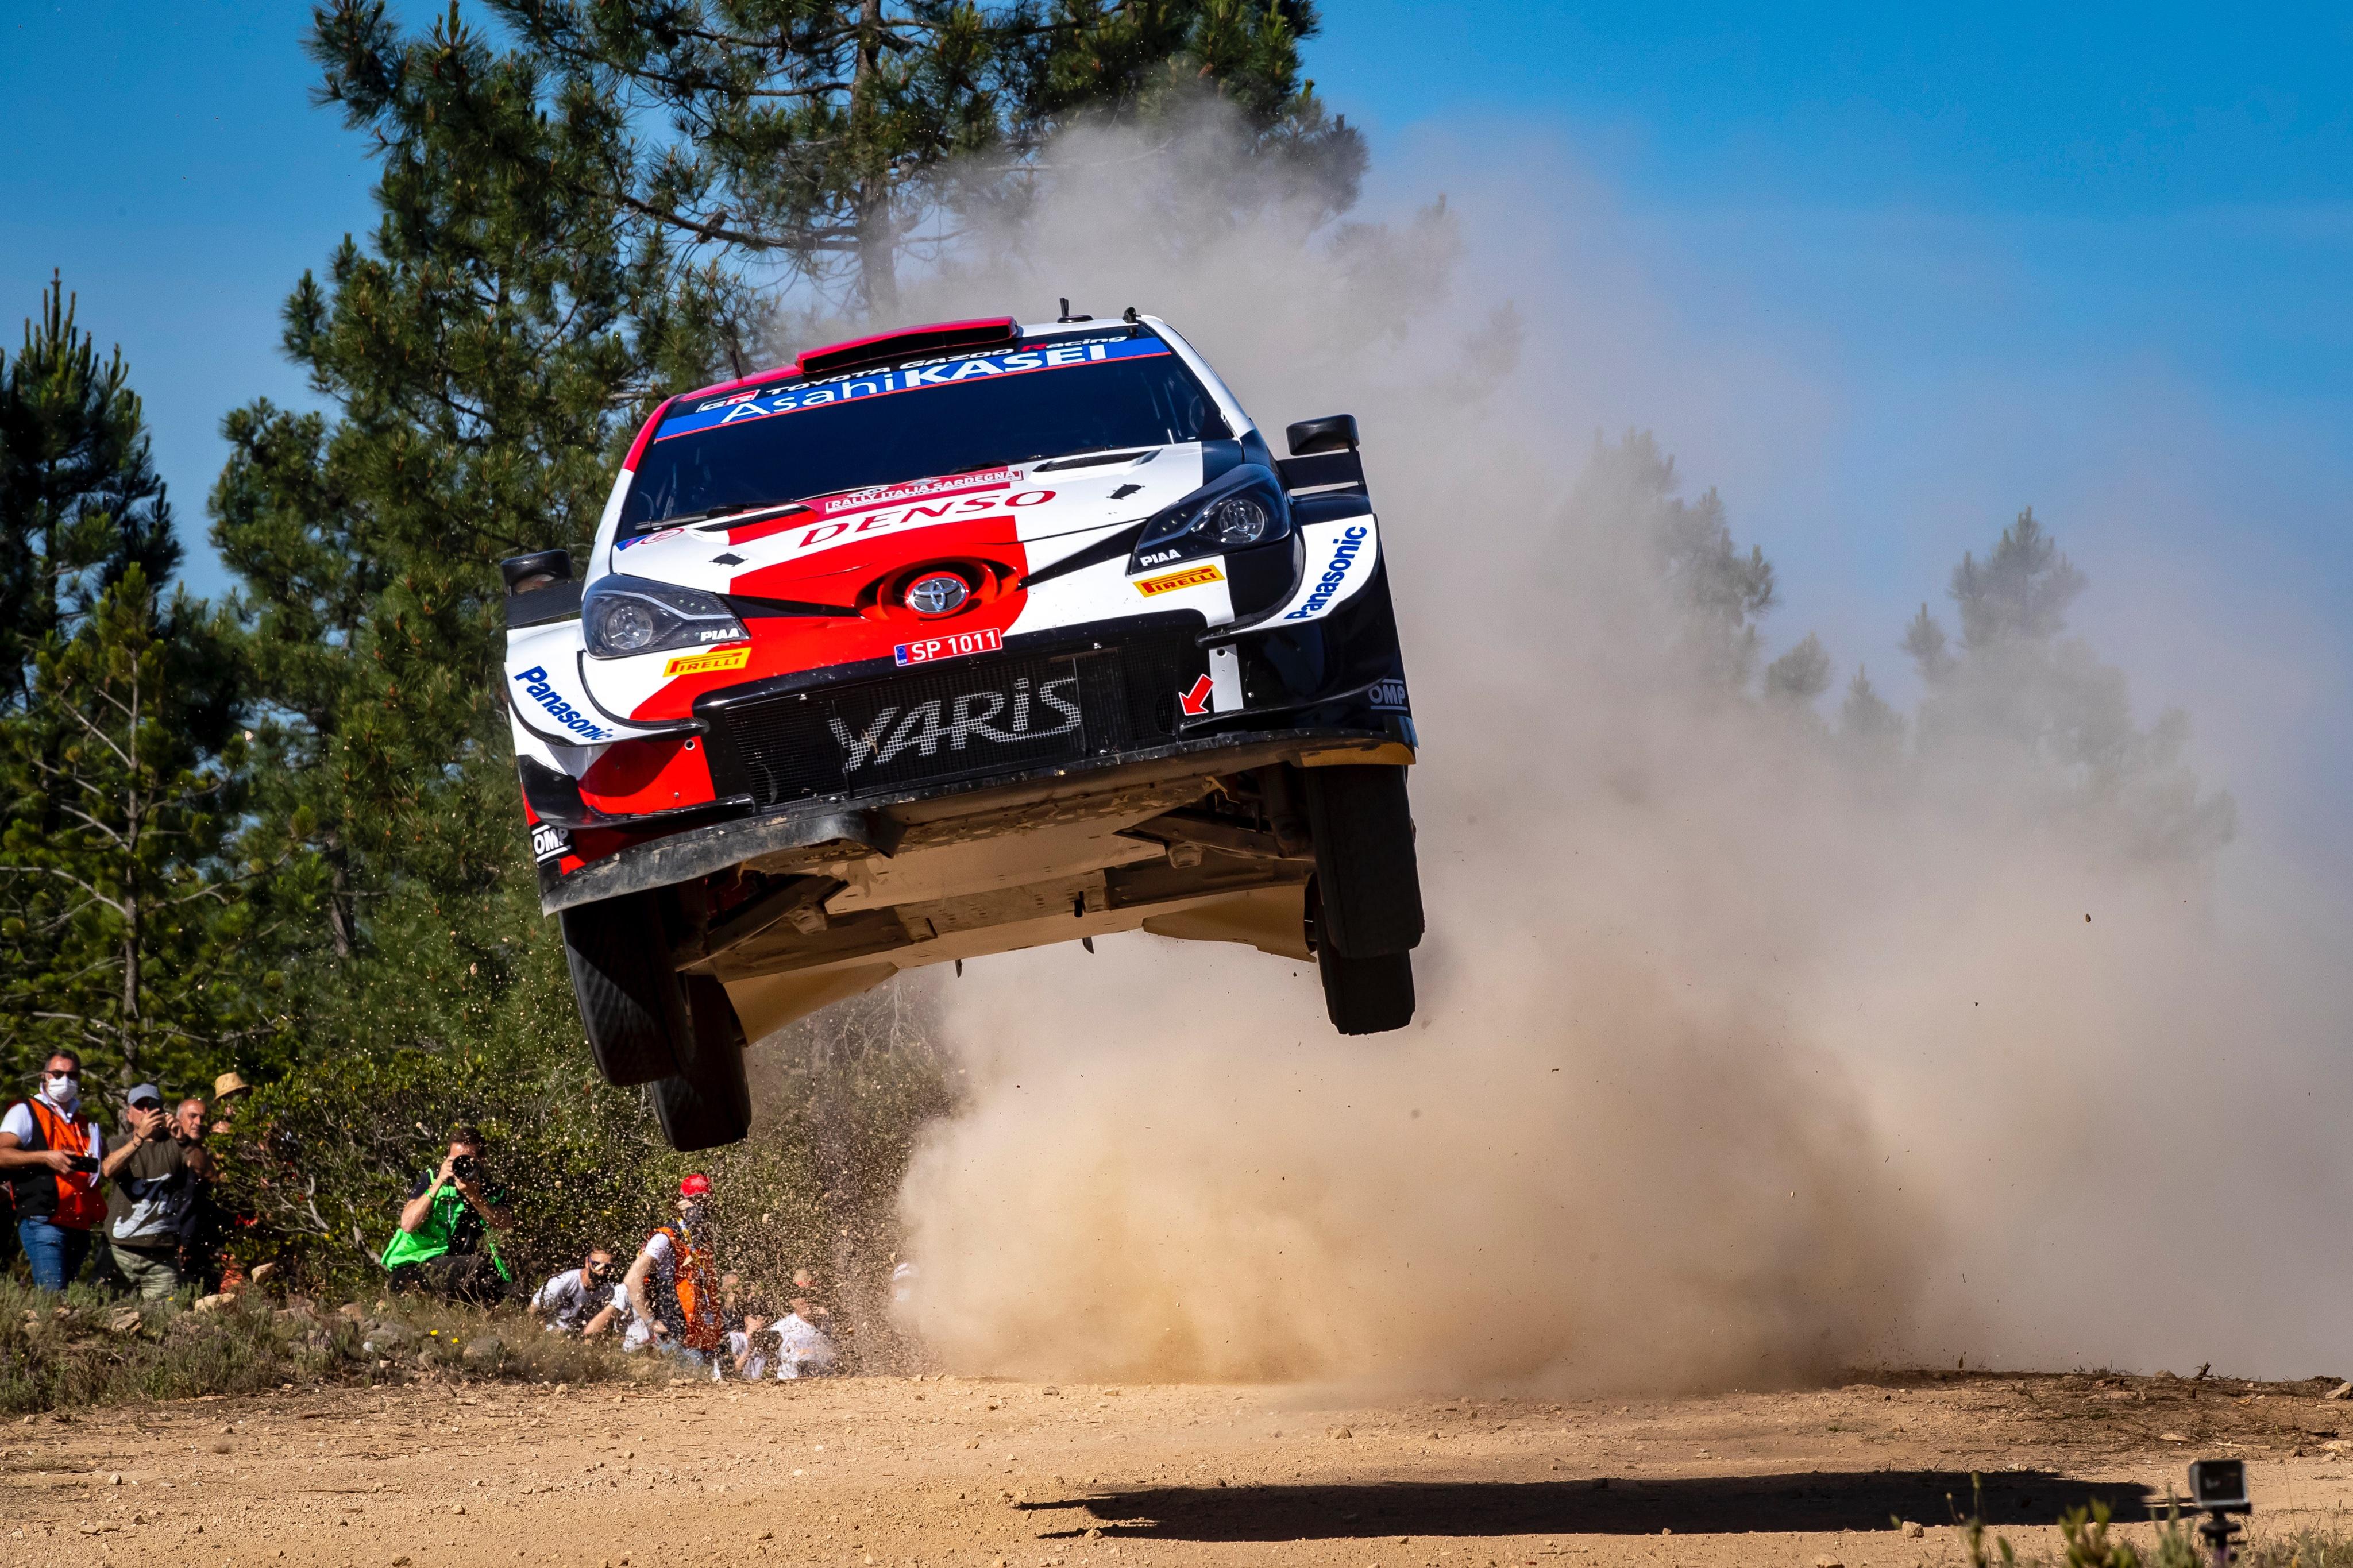 WRC: Rally d'Italia - Sardegna [3-6 Junio] - Página 3 E3C-w0QWUAIl4xa?format=jpg&name=4096x4096